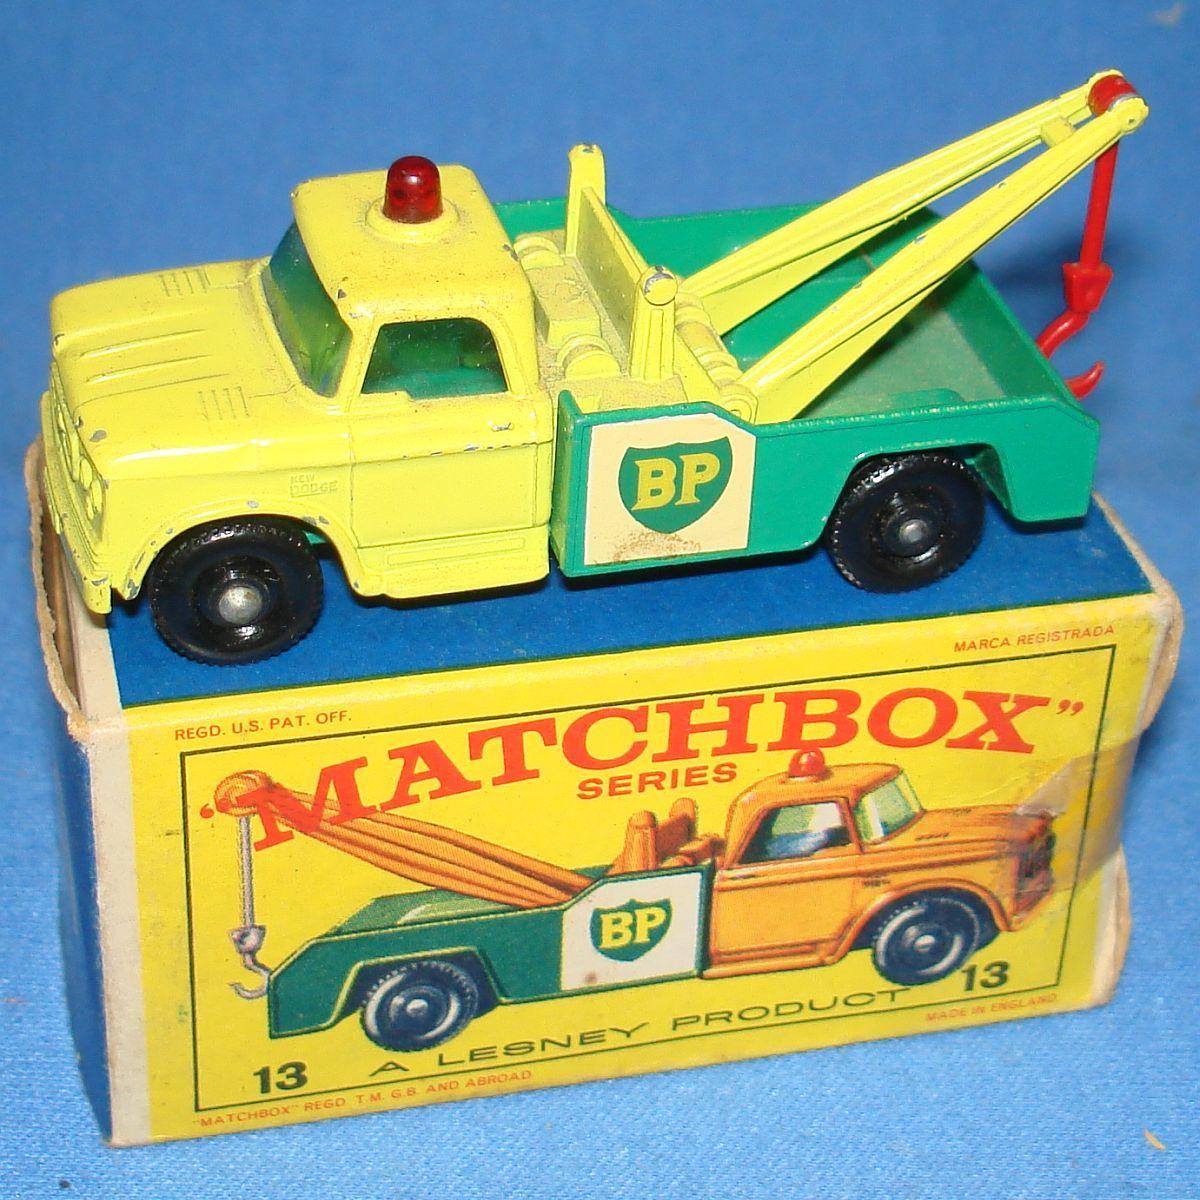 1960s-vintage-matchbox-garage-breakdown-services-truck-for-sale-01-a ...